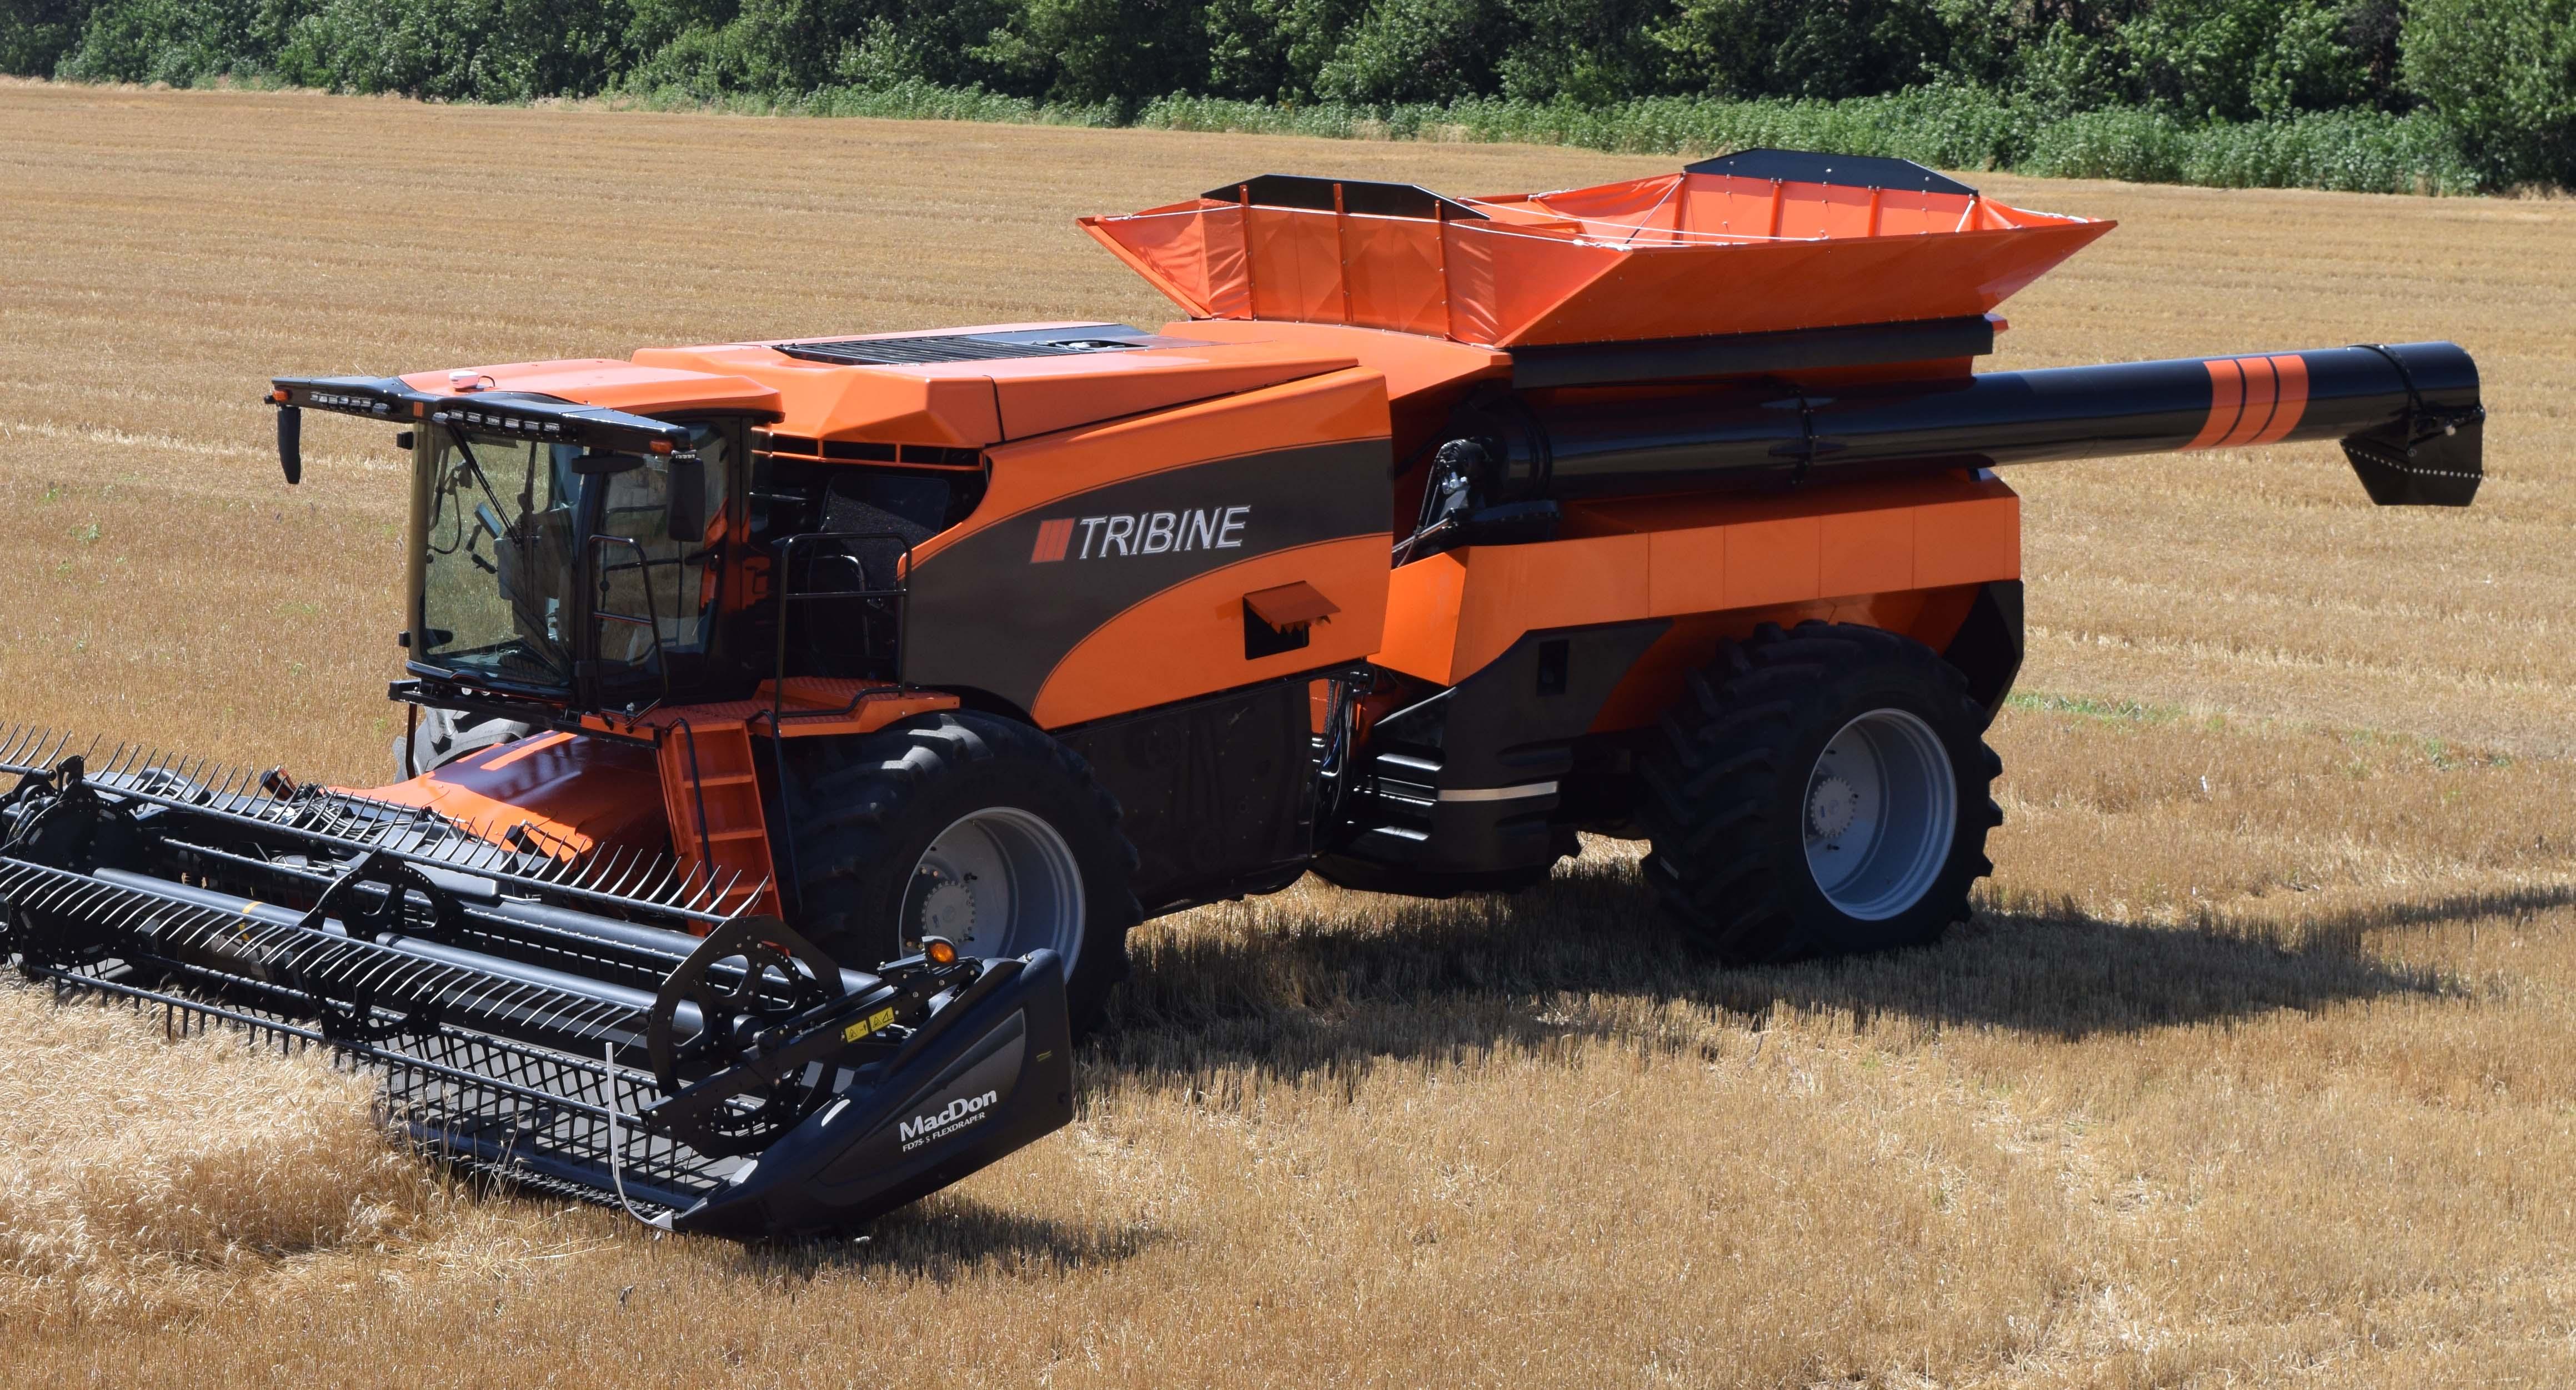 The All New Tribine Harvester TRIBINE